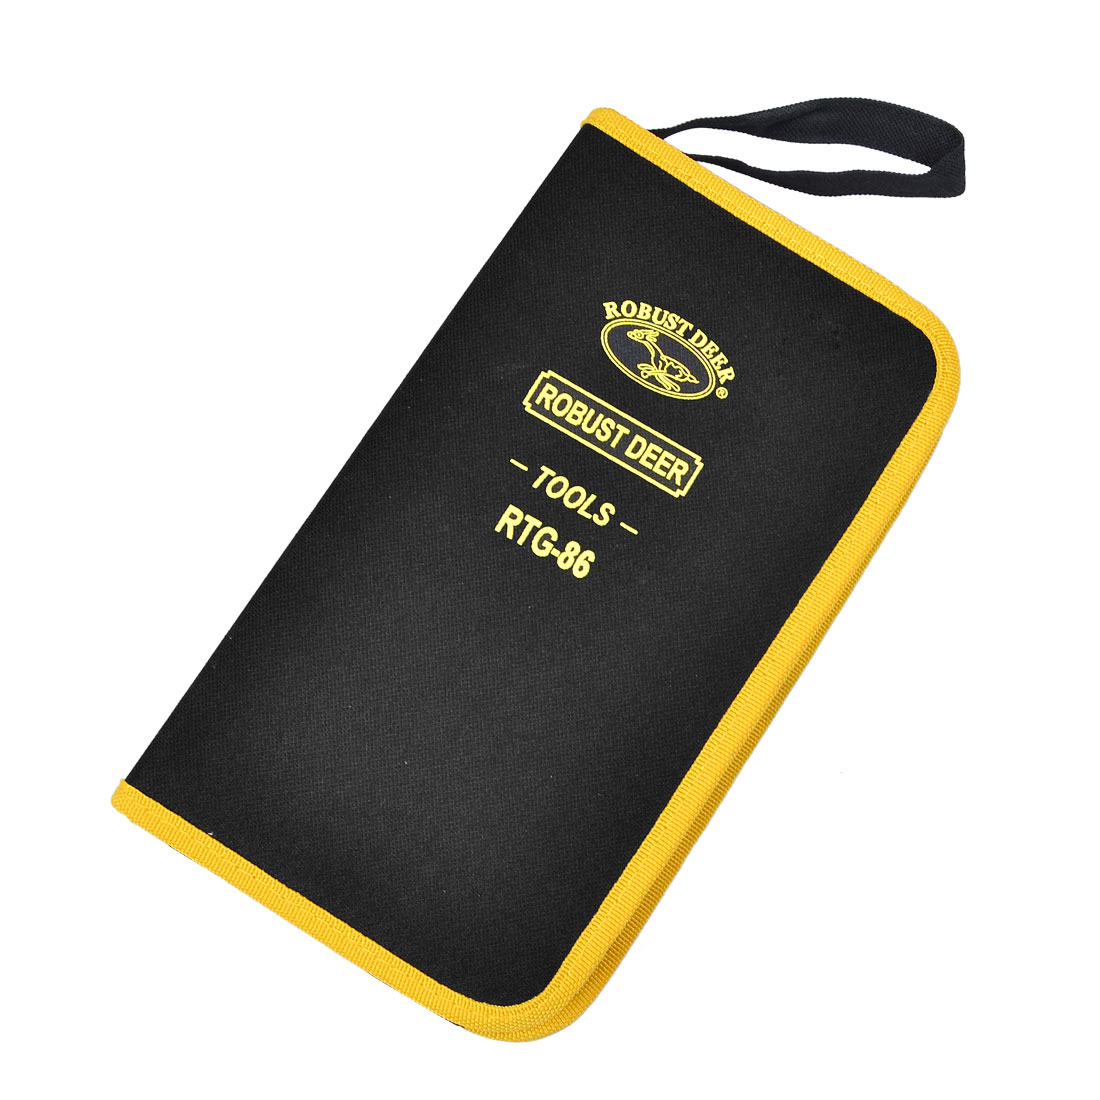 Scissor Pliers Black Yellow Nylon Tools Holder Pocket Organizer